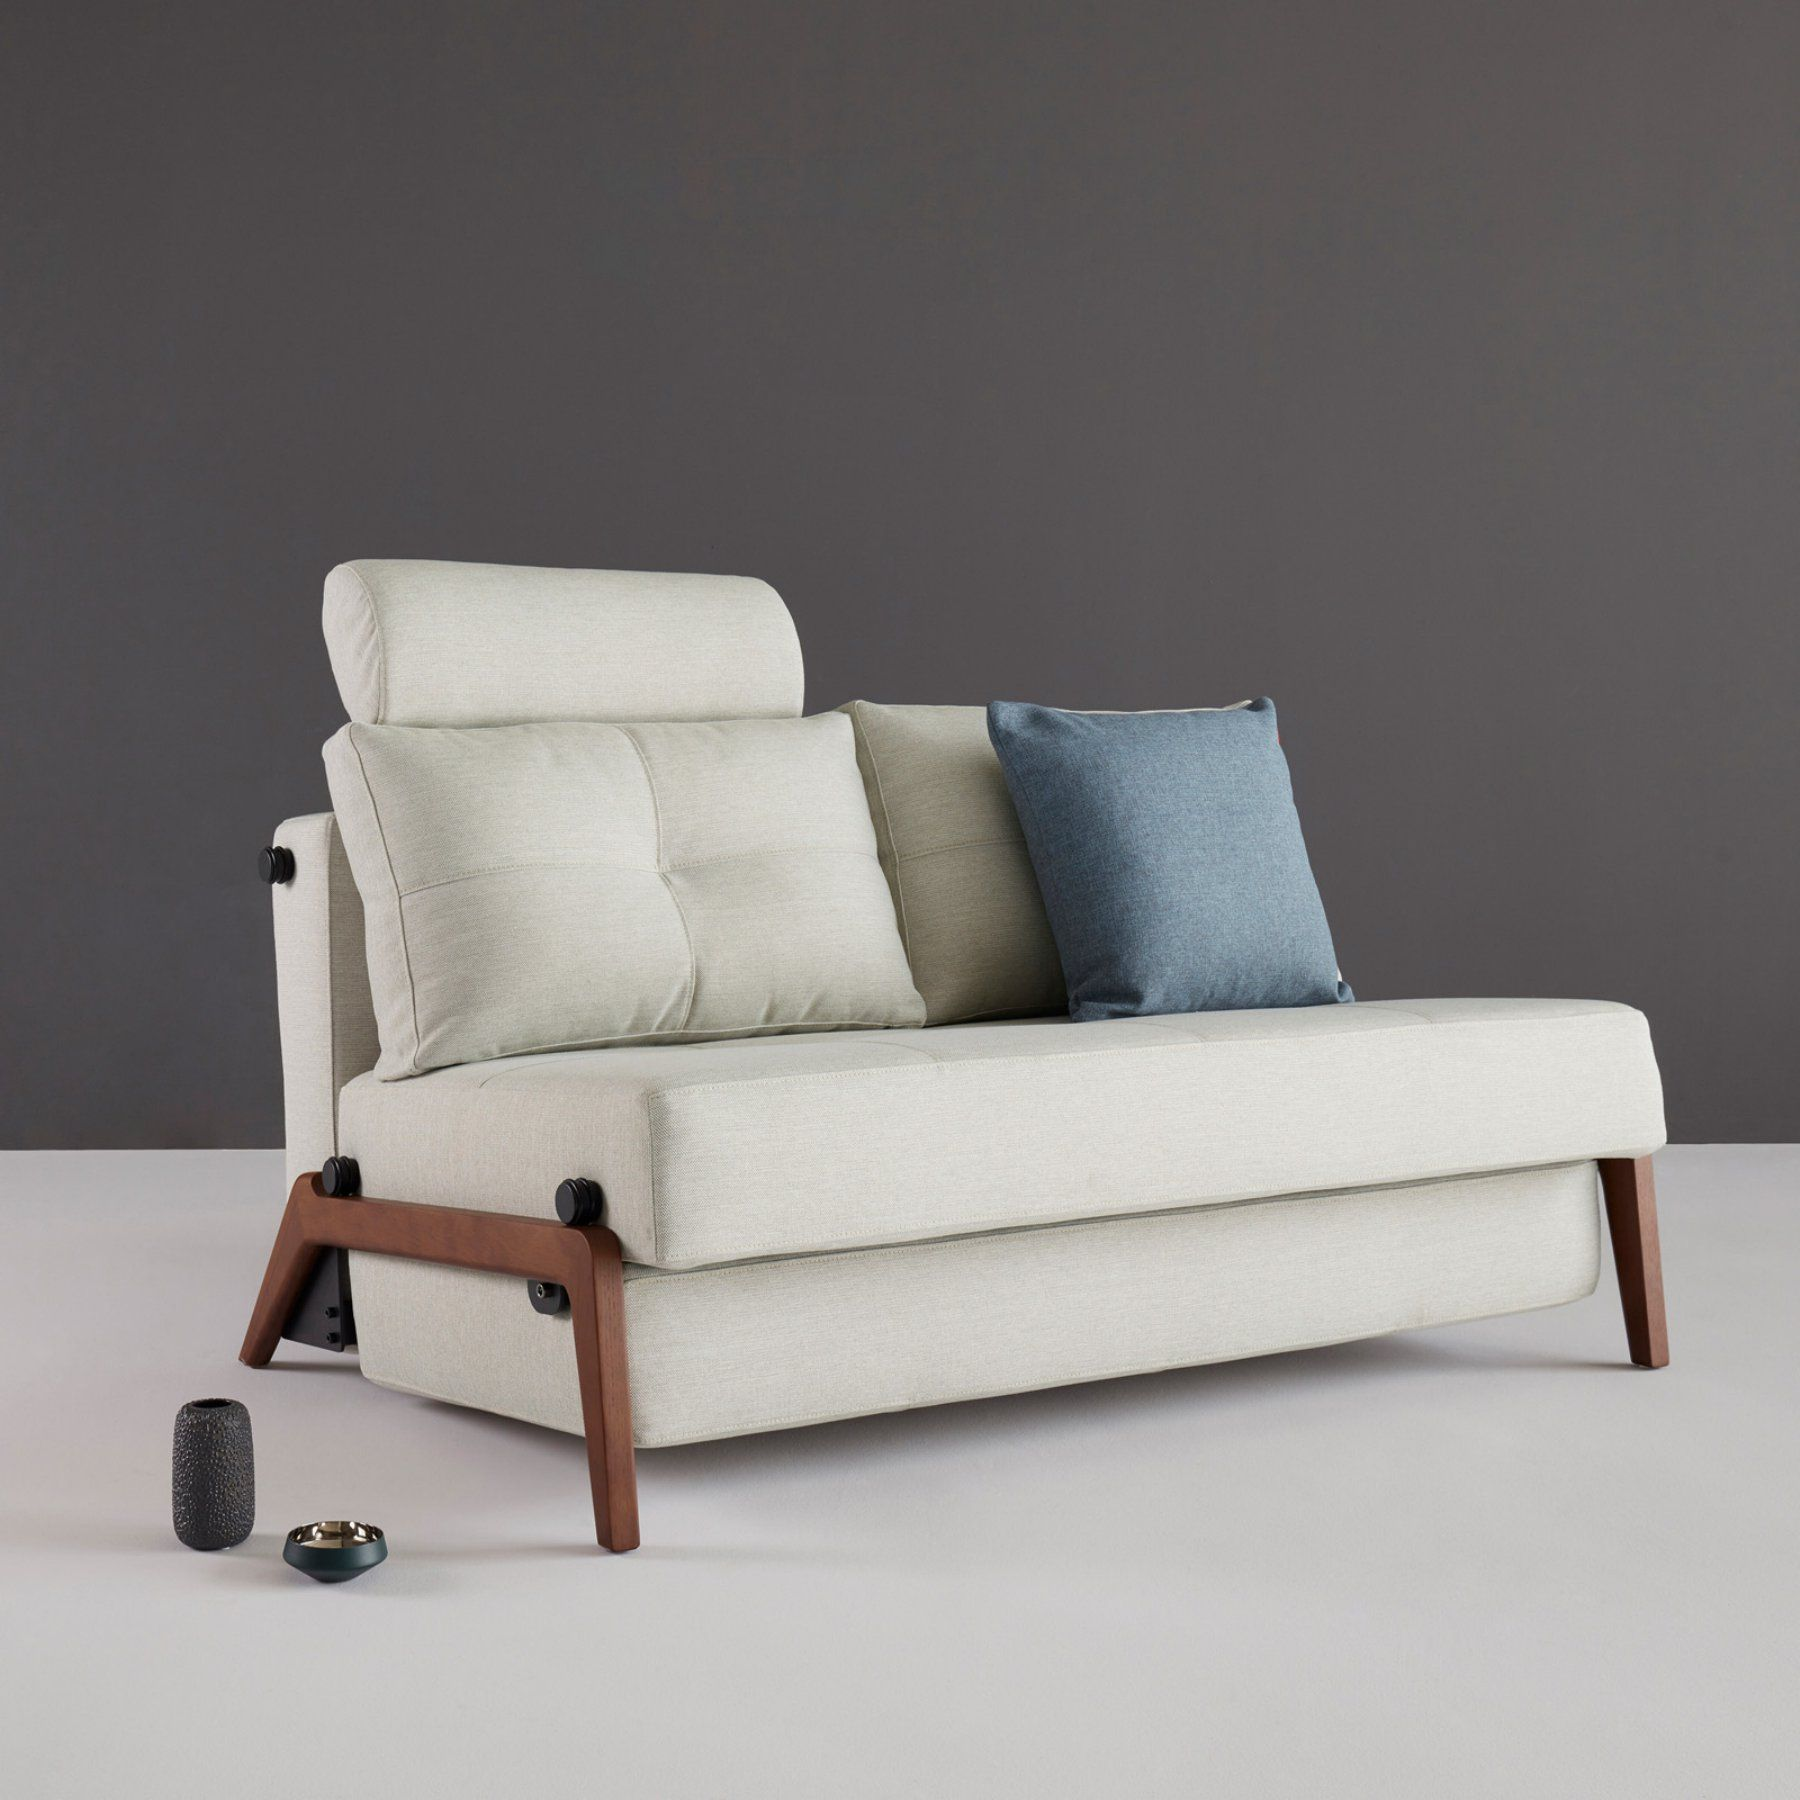 Wondrous Innovation Living Cubed Sofa 94 744001527 0 Products Uwap Interior Chair Design Uwaporg